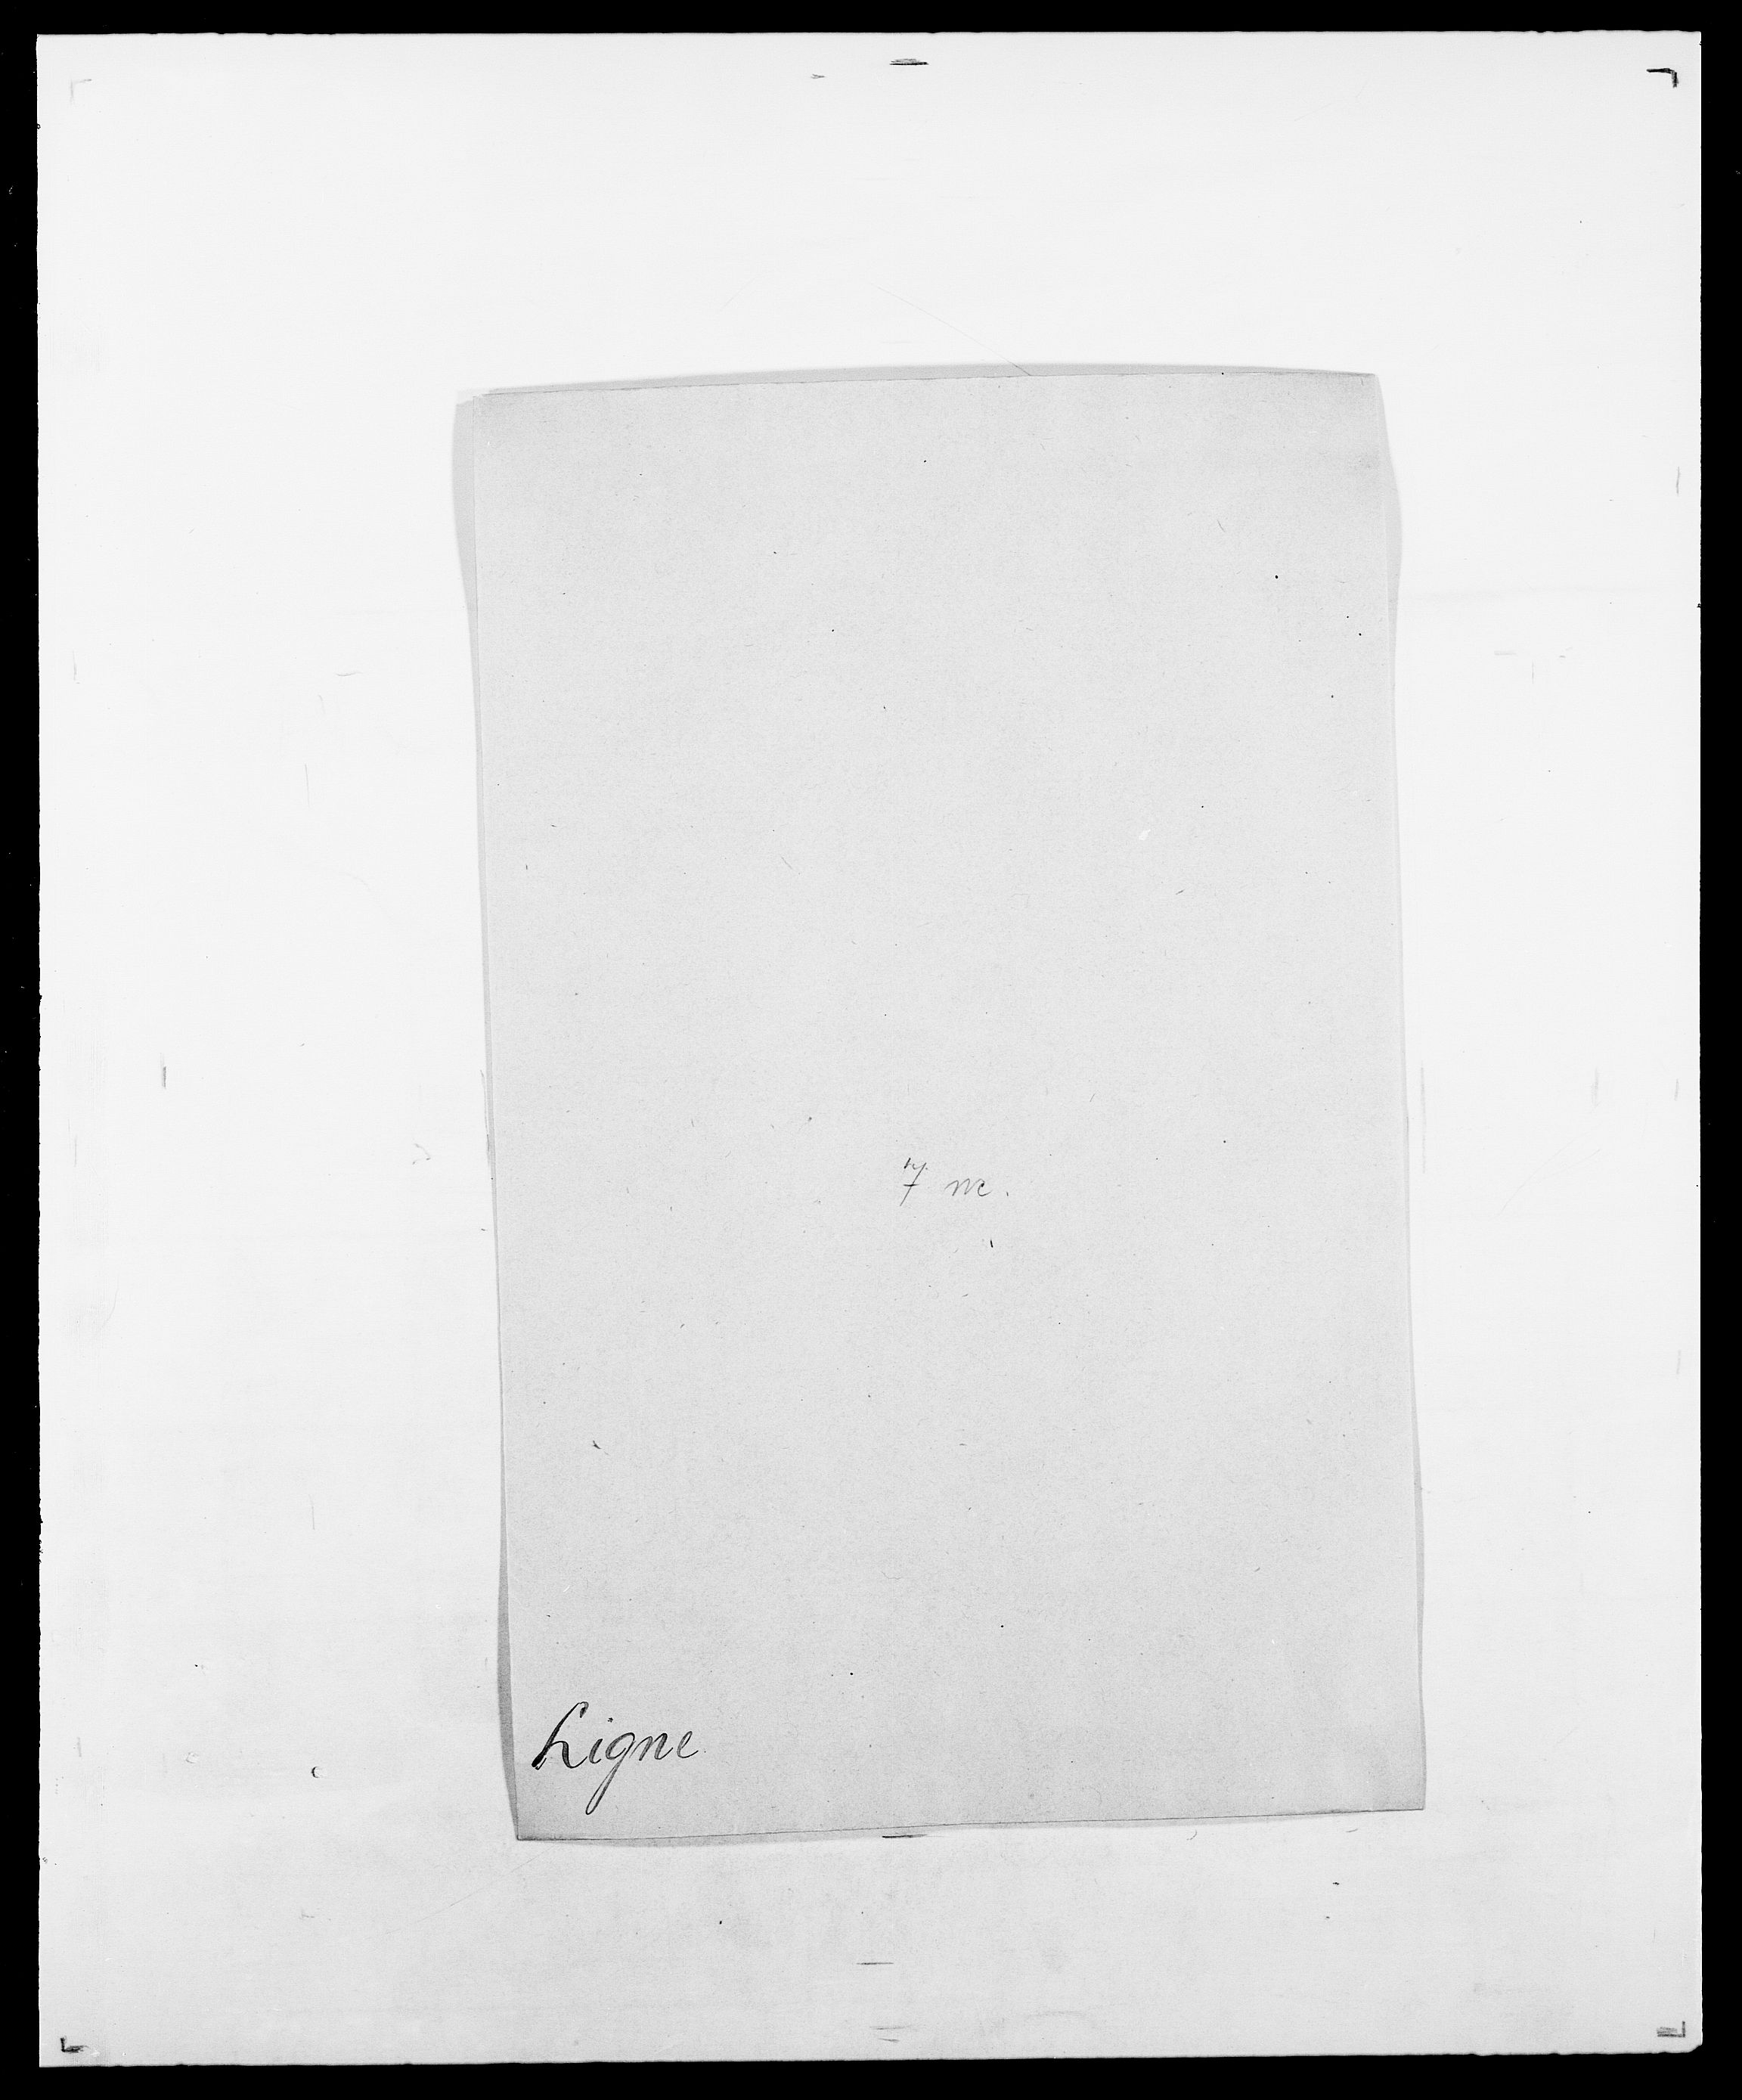 SAO, Delgobe, Charles Antoine - samling, D/Da/L0023: Lau - Lirvyn, s. 377